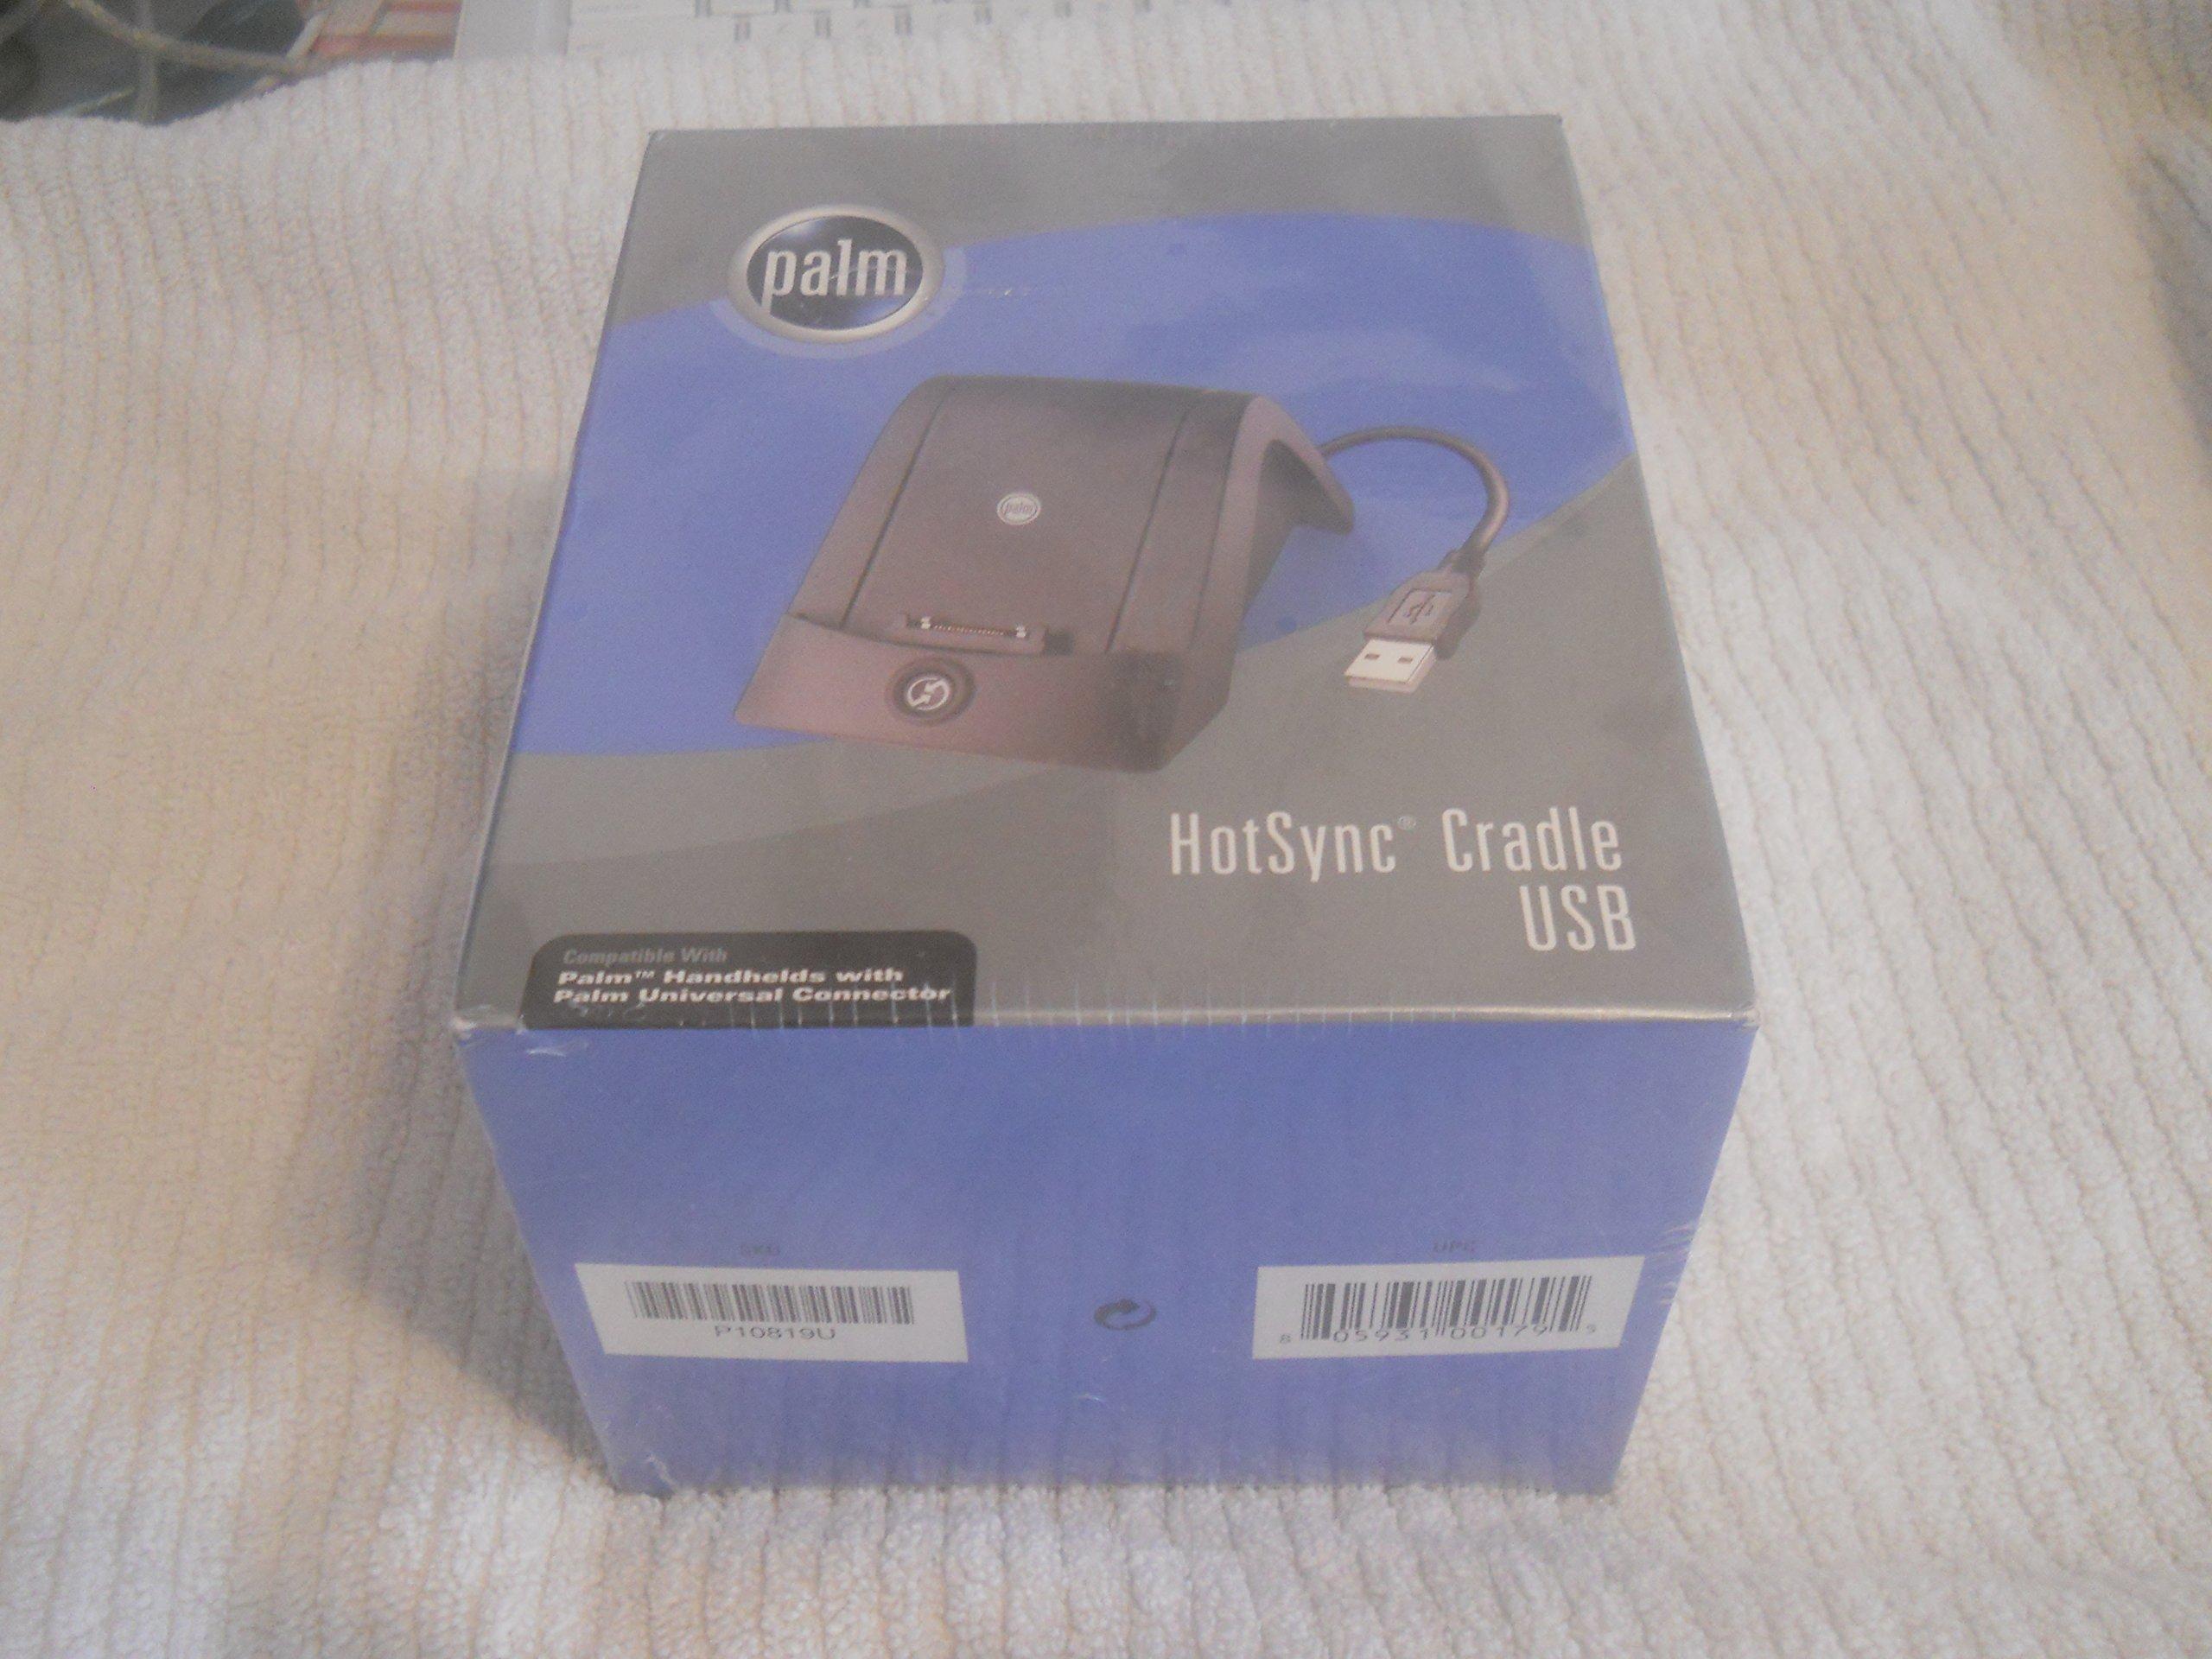 PalmOne HotSync Cradle USB (m125, m130, i705, Tungsten (Except E), m500 Series)